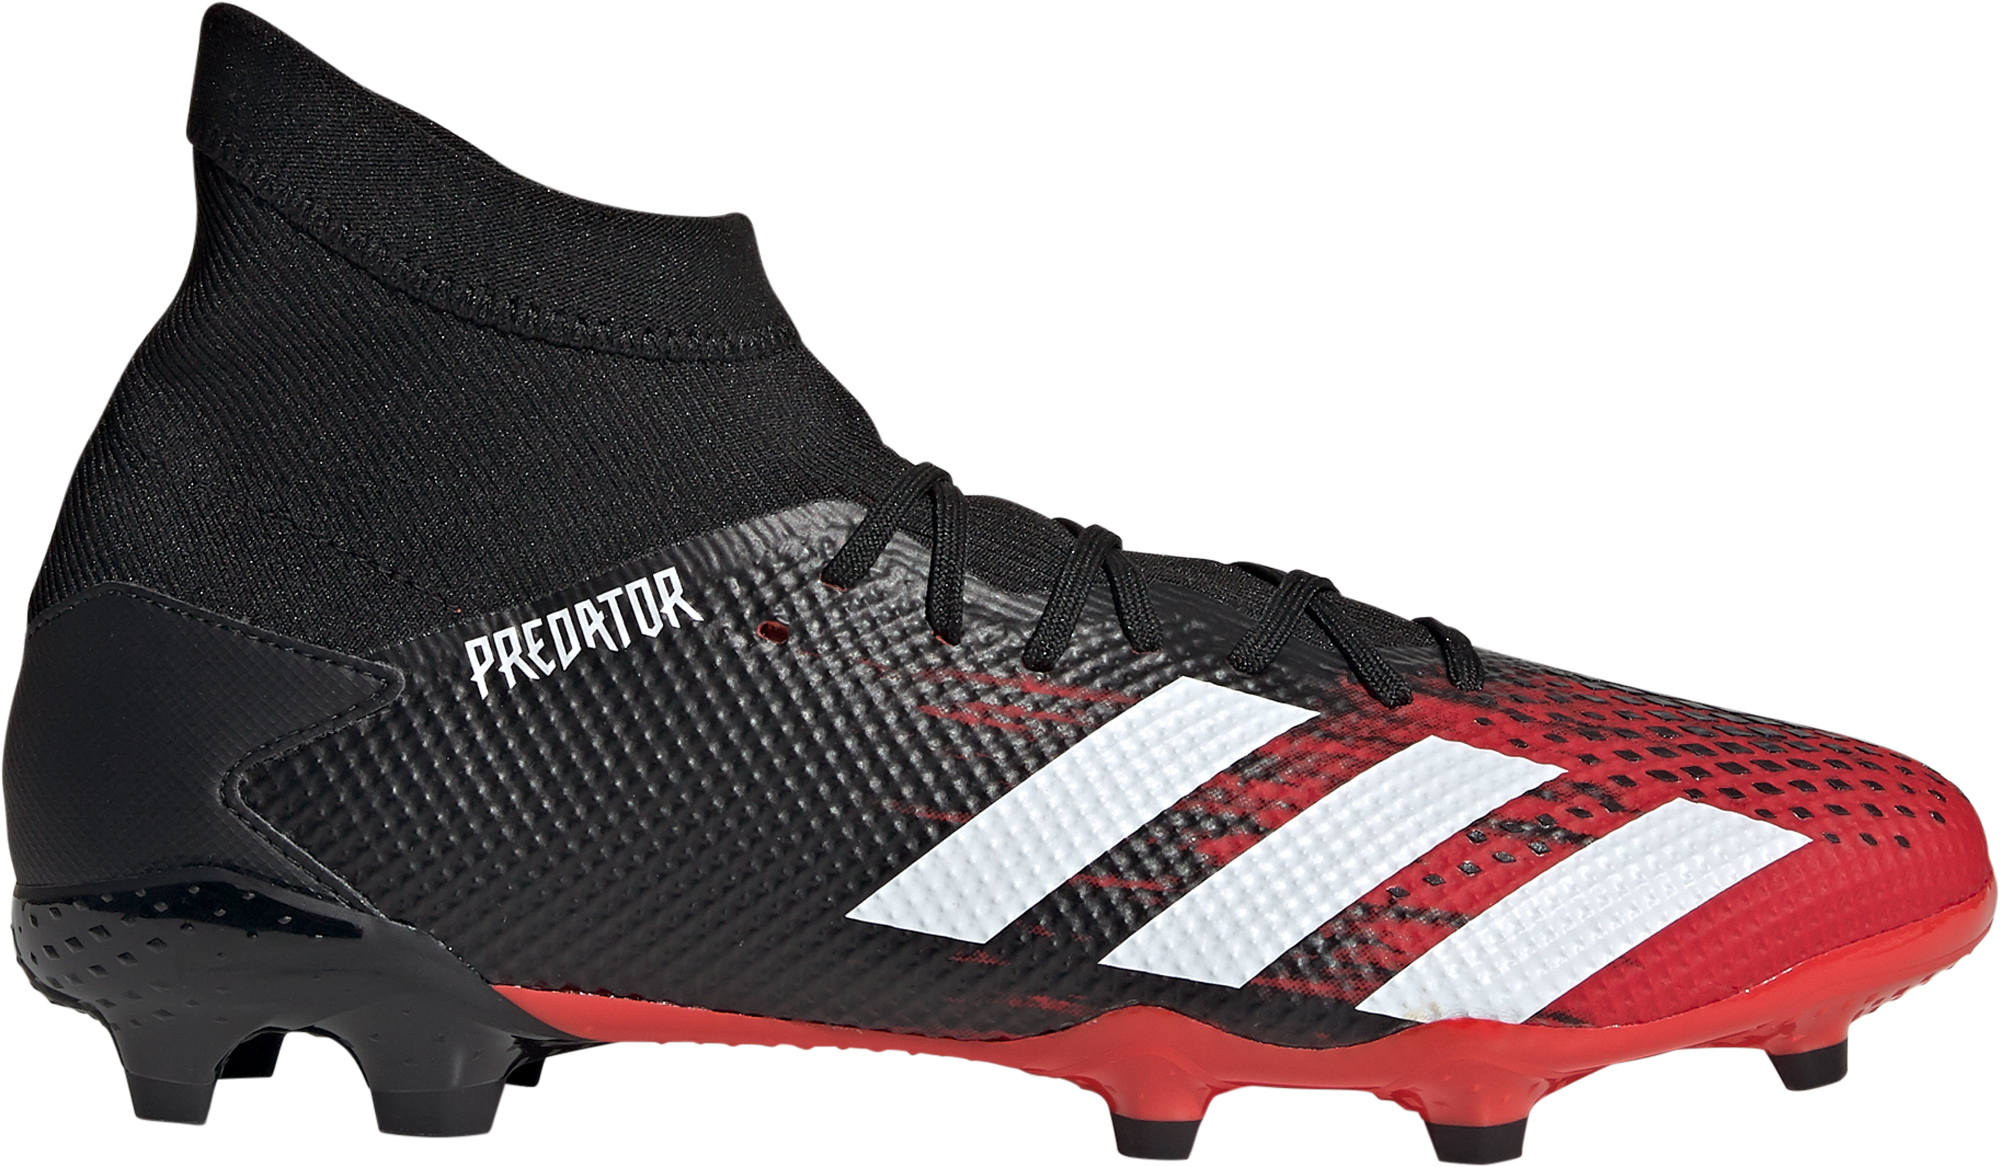 Adidas Бутсы мужские Adidas Predator 20.3 FG, размер 38 бутсы adidas predator 18 3 fg db2001